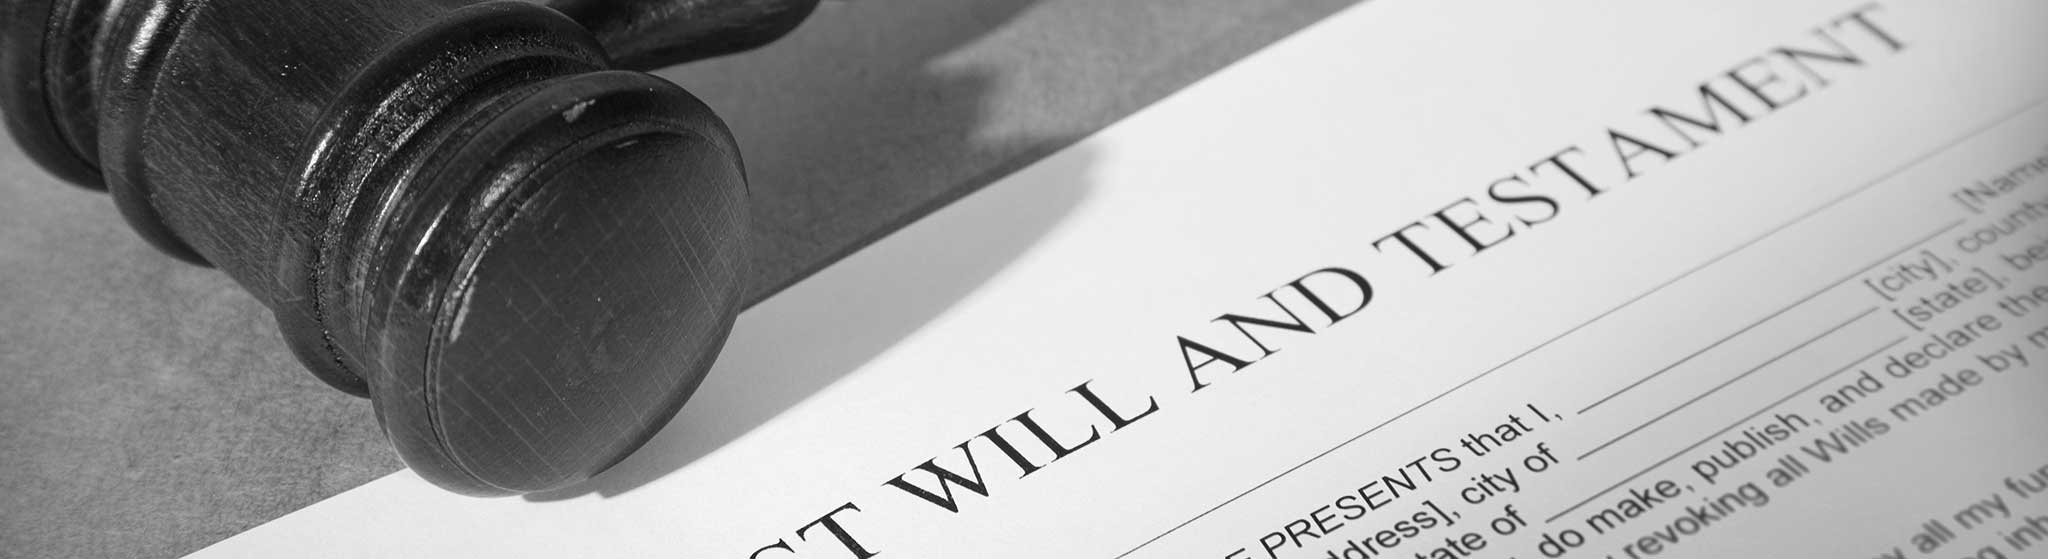 wills-and-testiments-law-kelowna-bc